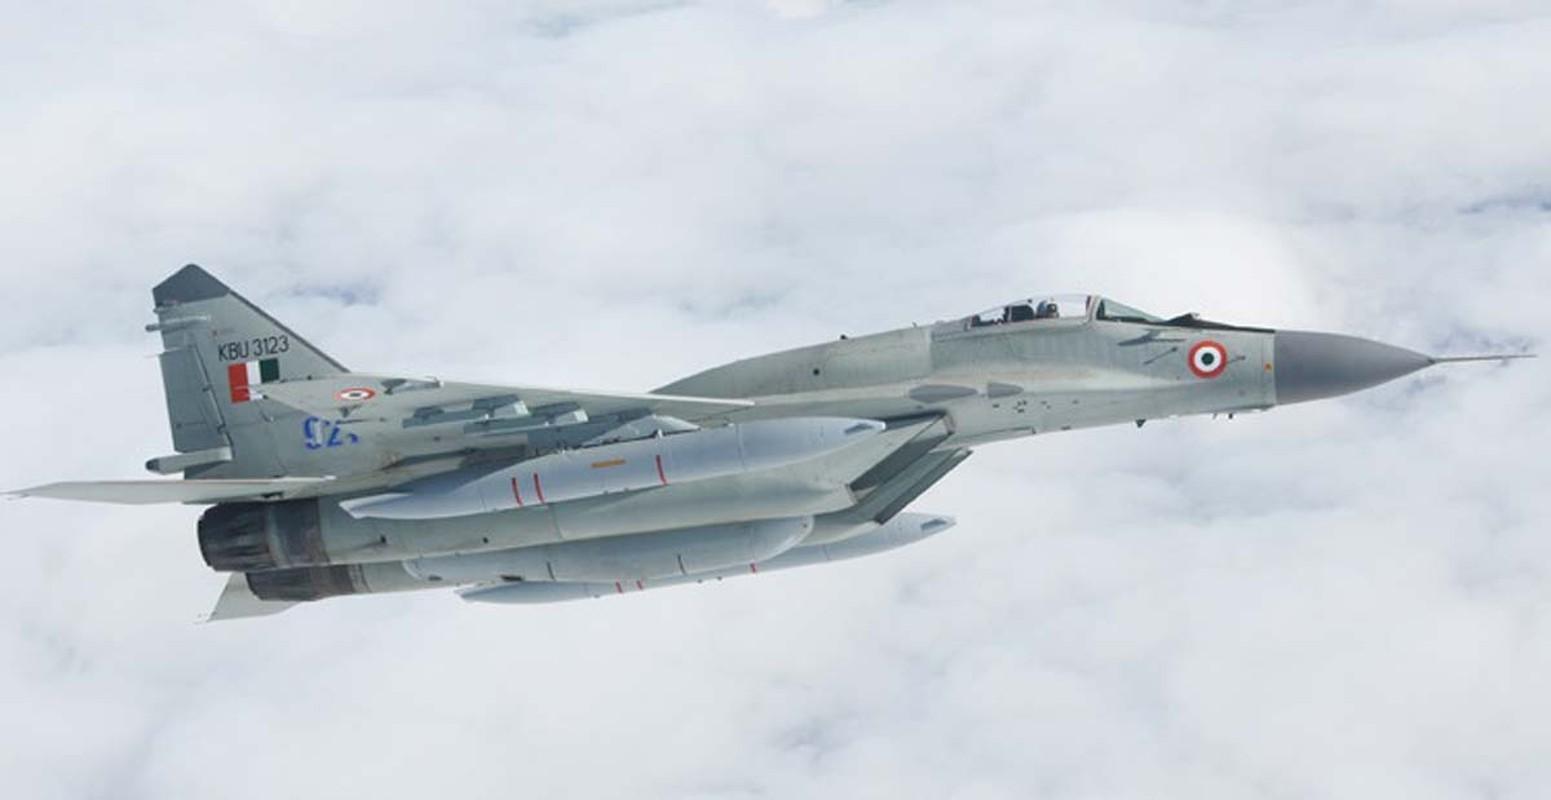 Ukraine rat muon mua tiem kich F-35 nhung chi du tien cho MiG-29-Hinh-7